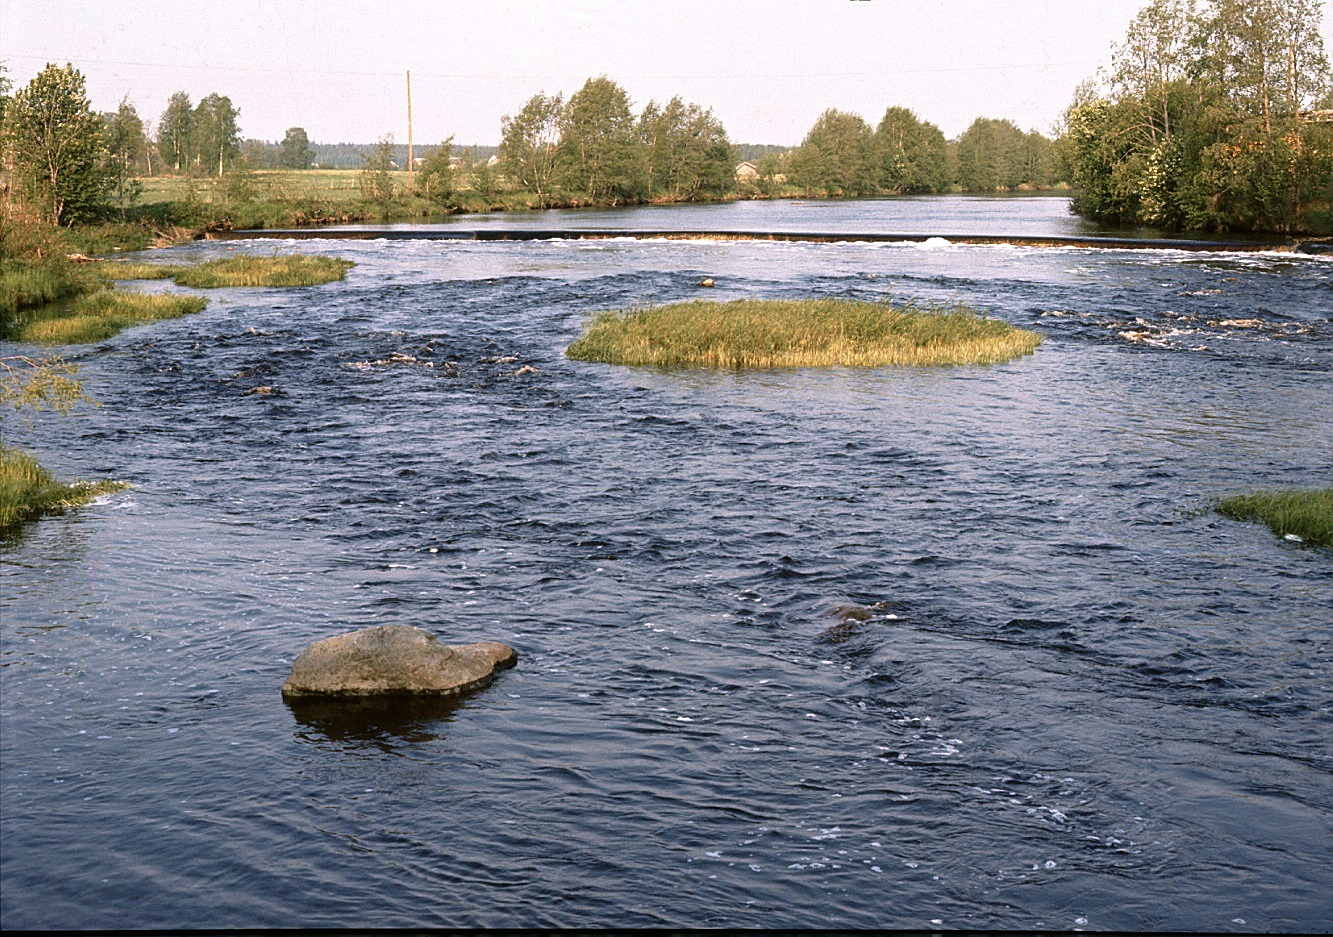 Dammen i Klemetsforsen fotograferad från Klemets-bron. År 1972.